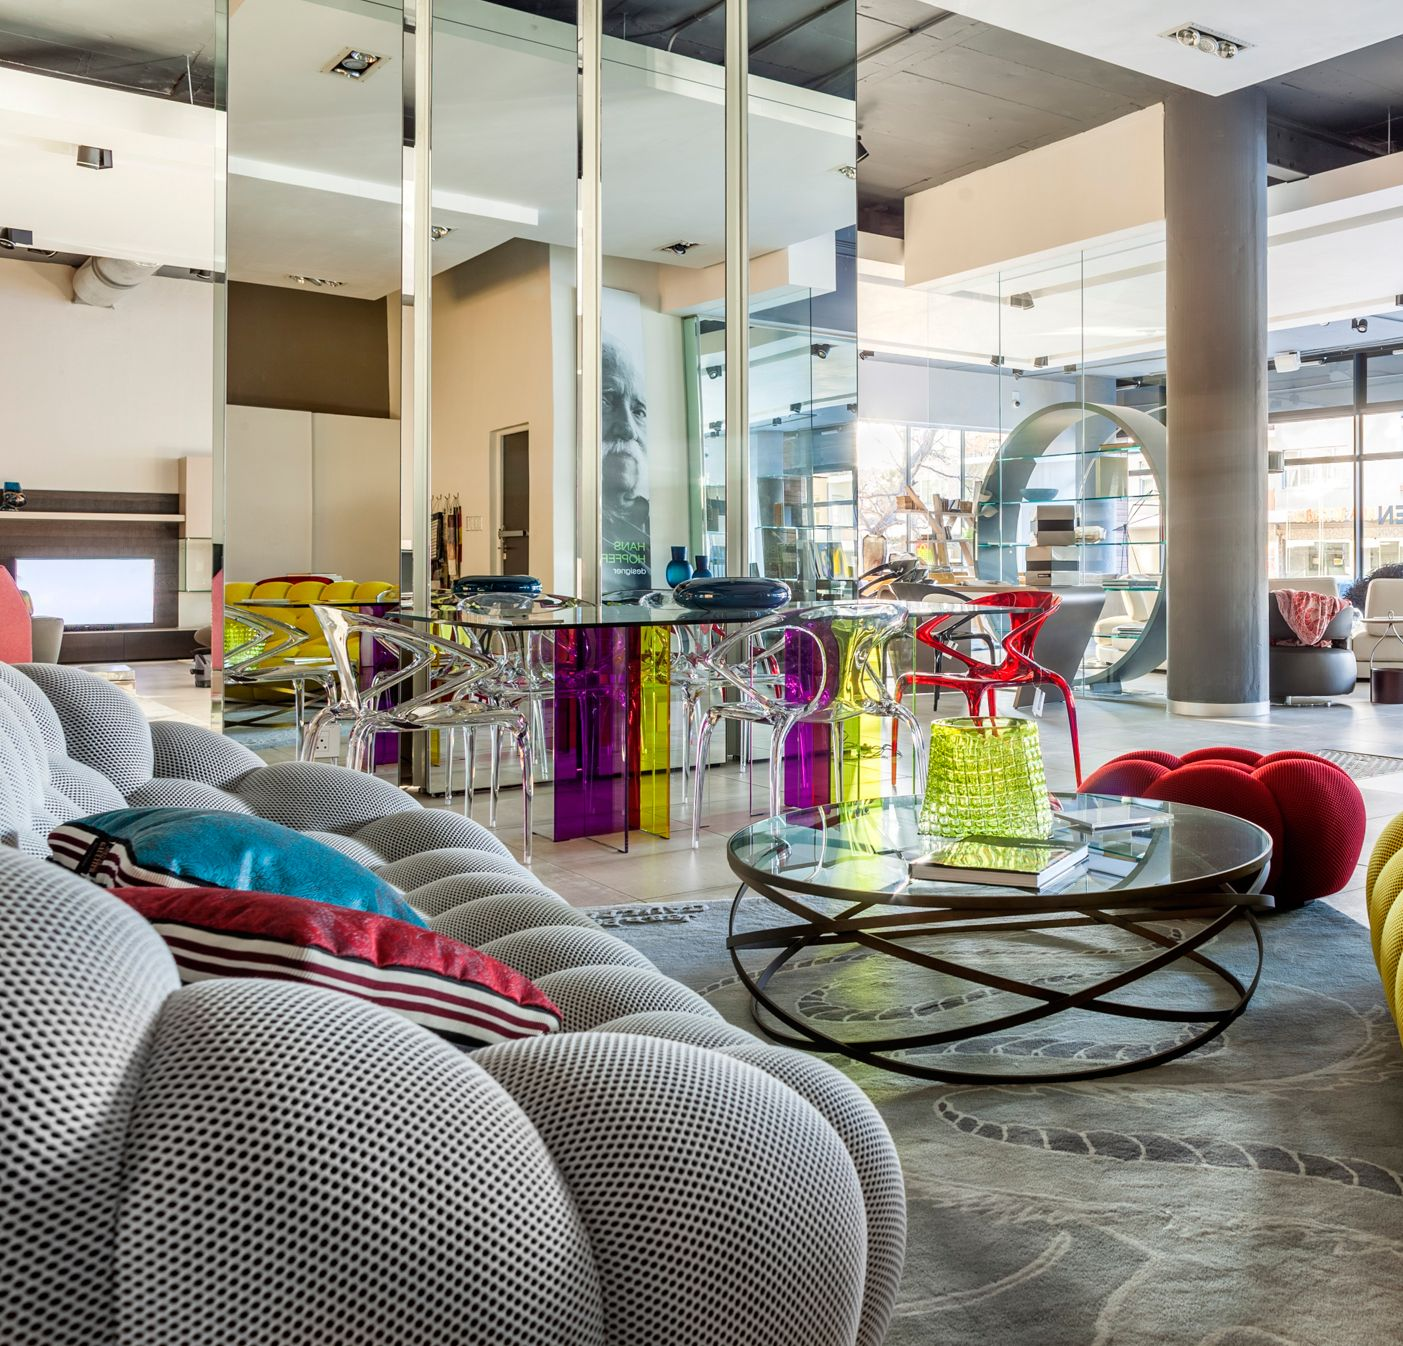 magasin roche bobois cape town 8001. Black Bedroom Furniture Sets. Home Design Ideas